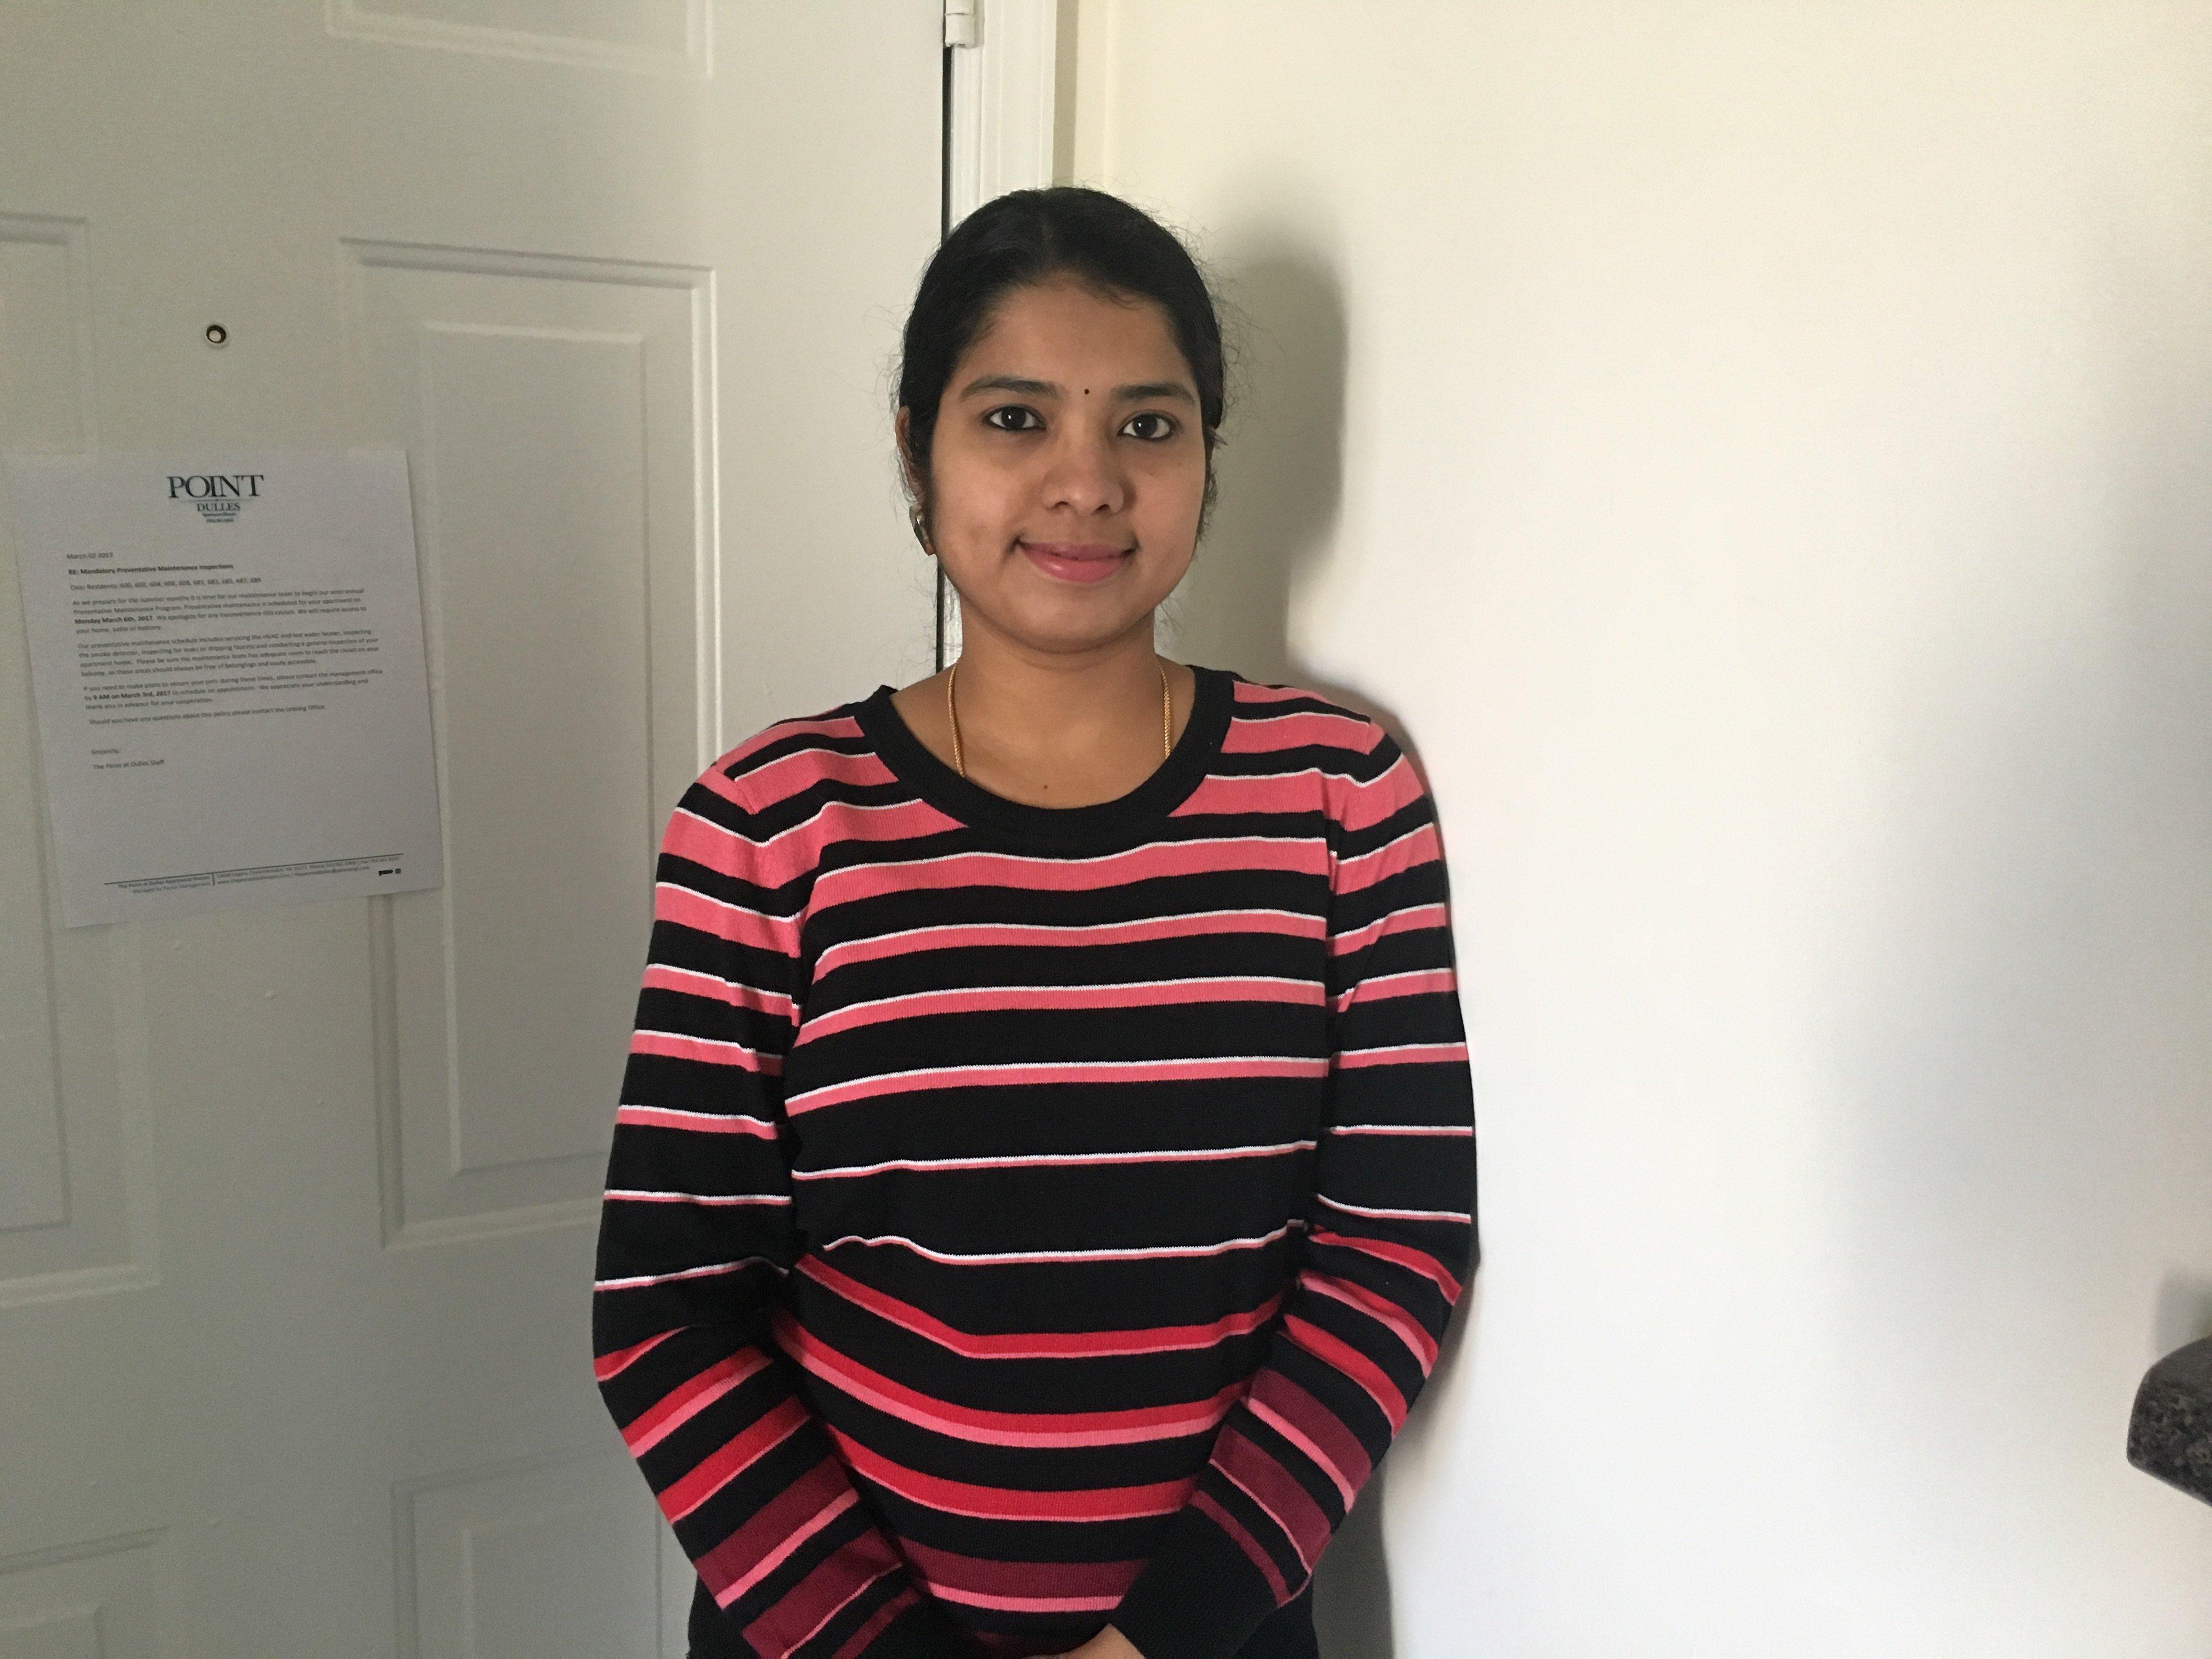 Dr. Revathi Sundaramurthy